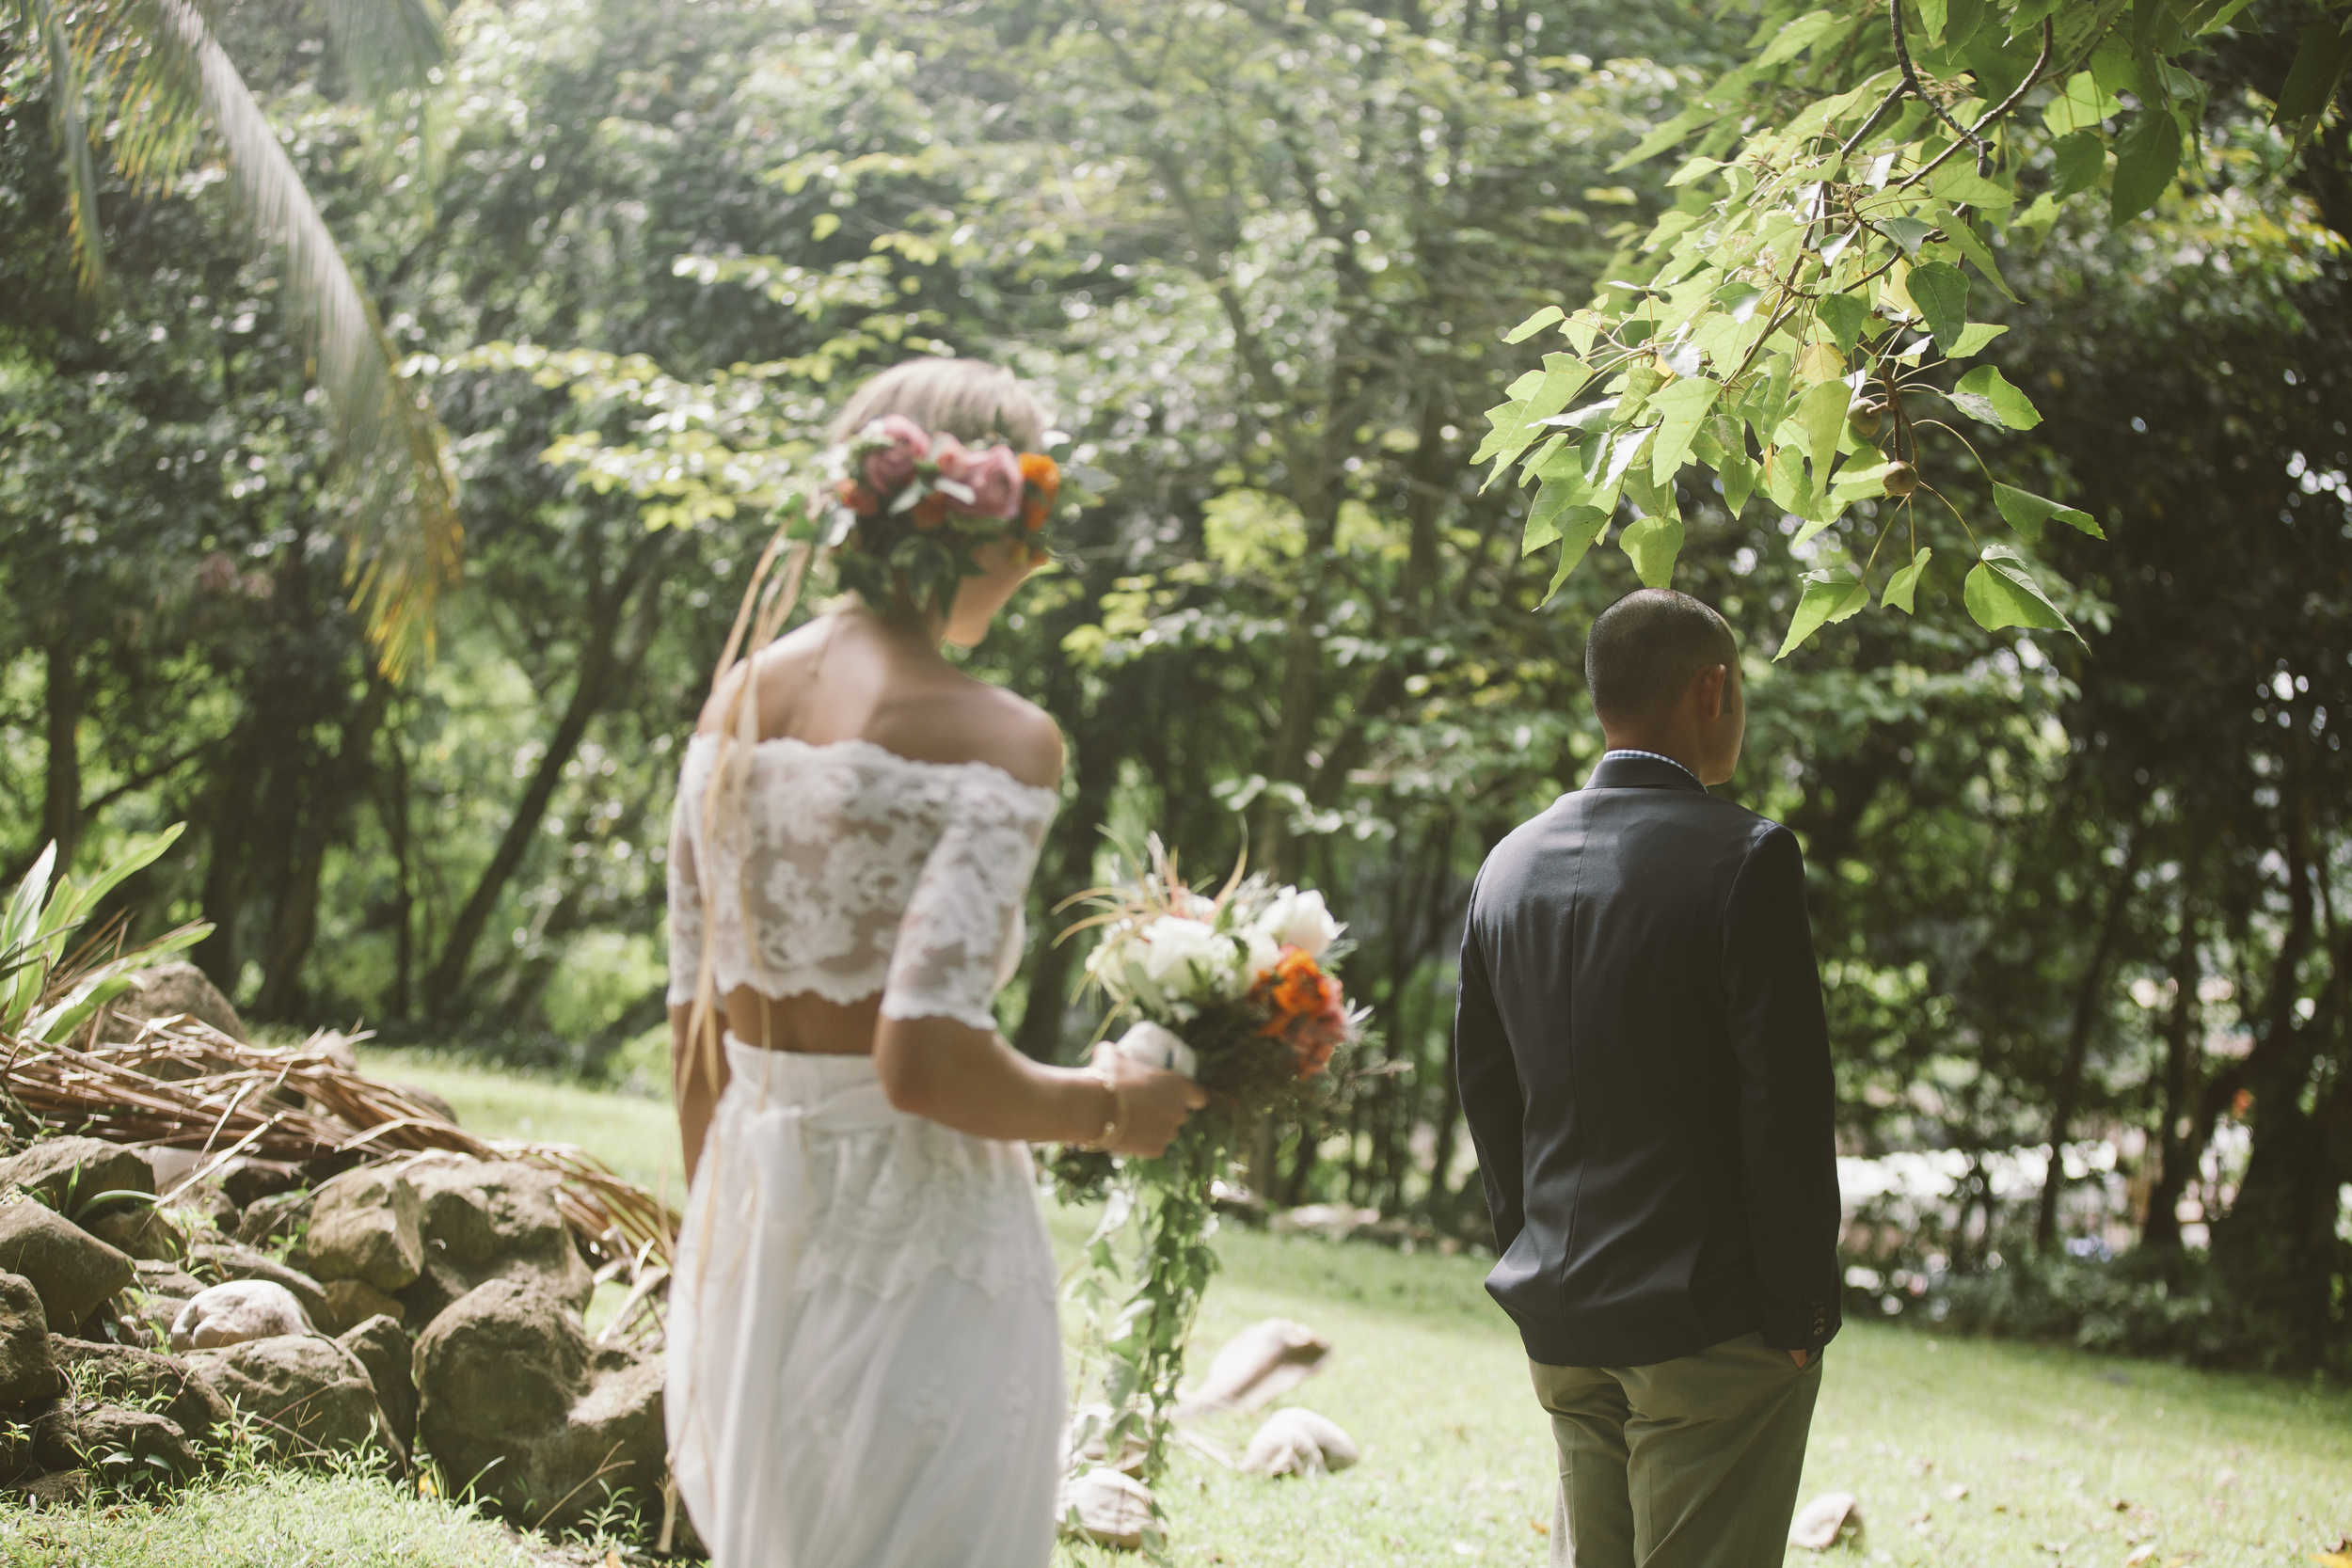 angie-diaz-photography-oahu-hawaii-wedding-tradewinds-ranch-36.jpg